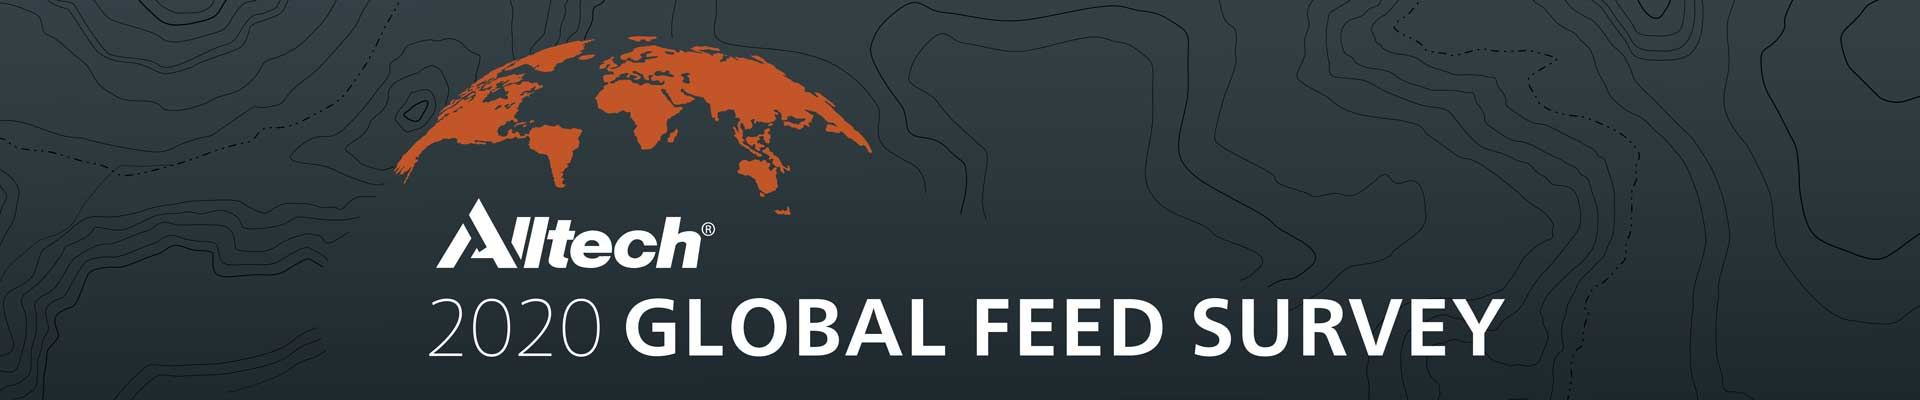 Alltech 2020 Global Feed Survey header image